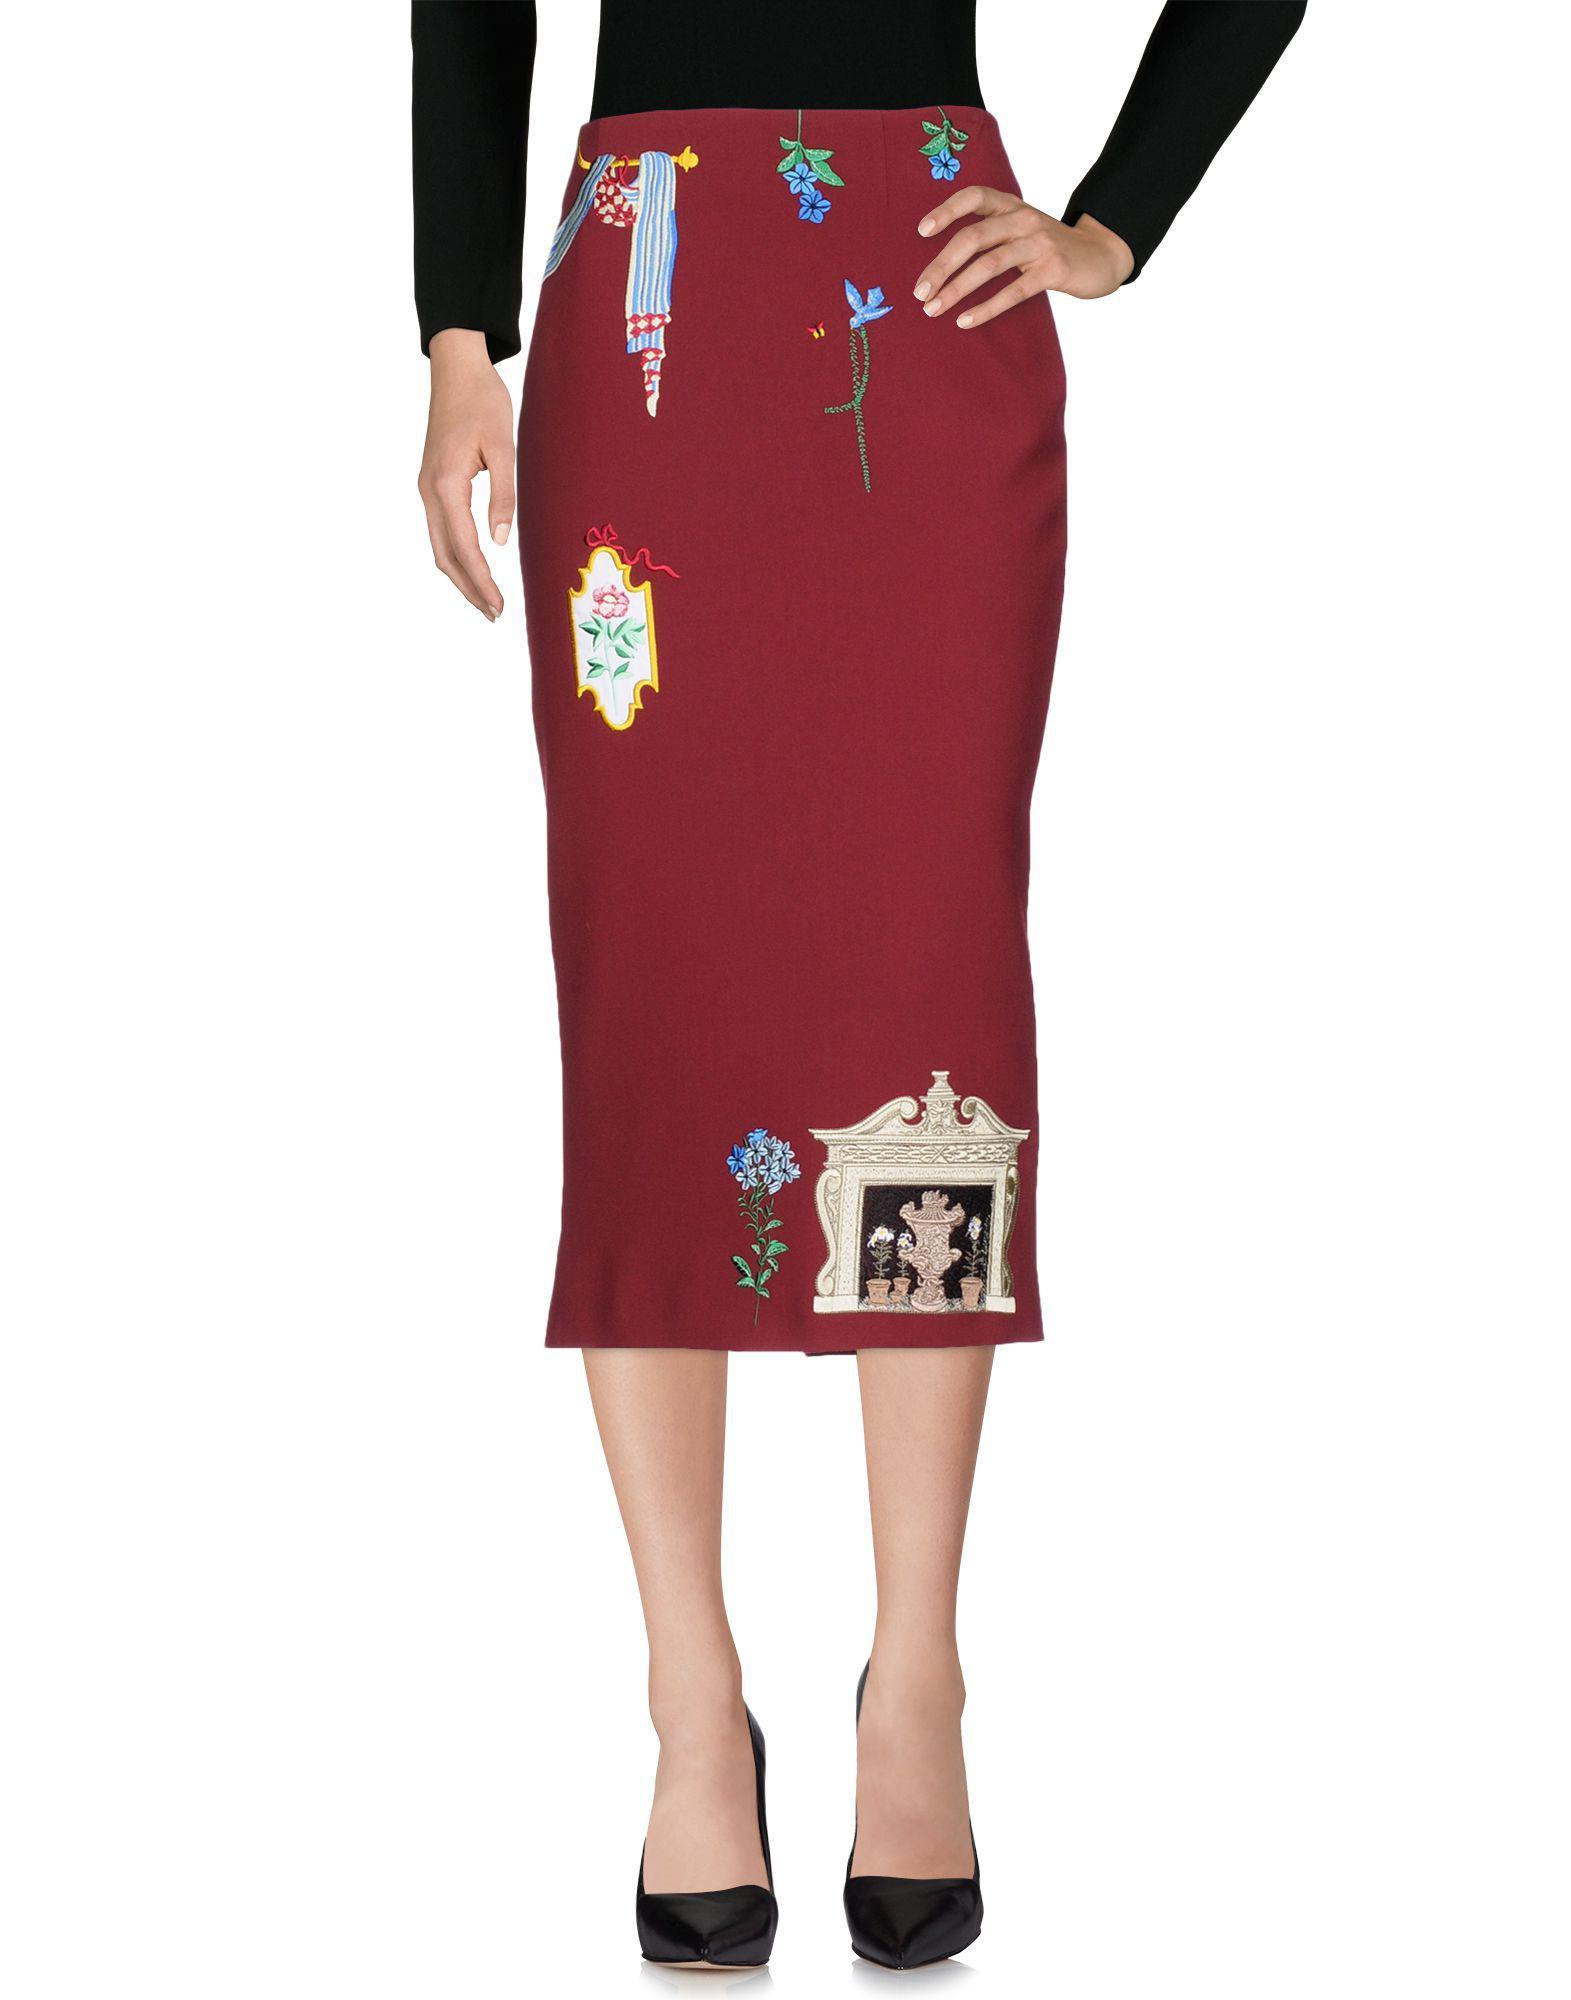 fd71a24a7f Vivetta 3/4 Length Skirt in Red - Lyst